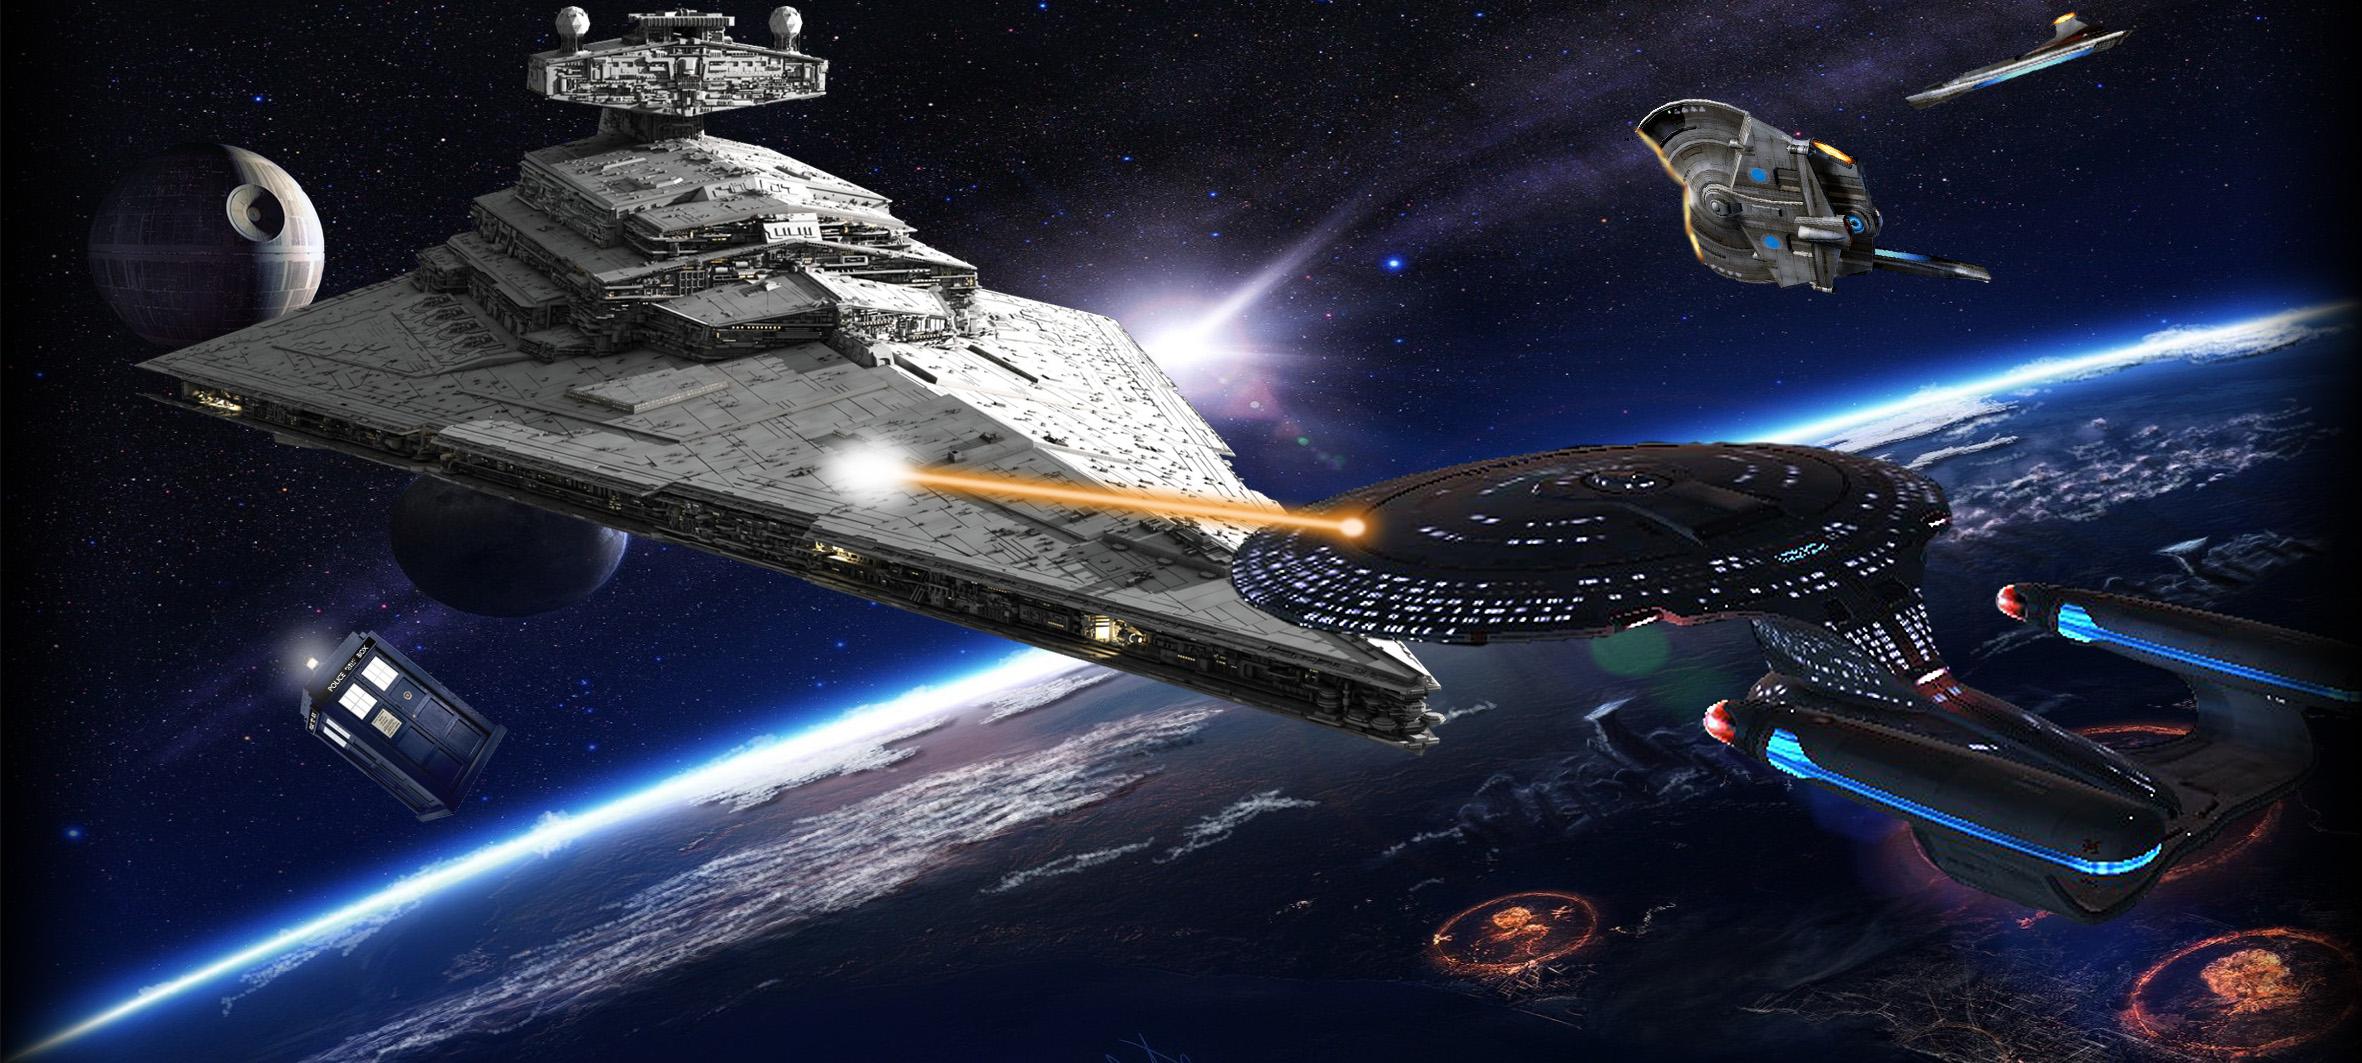 Crossover Star Trek Star Wars Doctor Who By Ct1271 On Deviantart